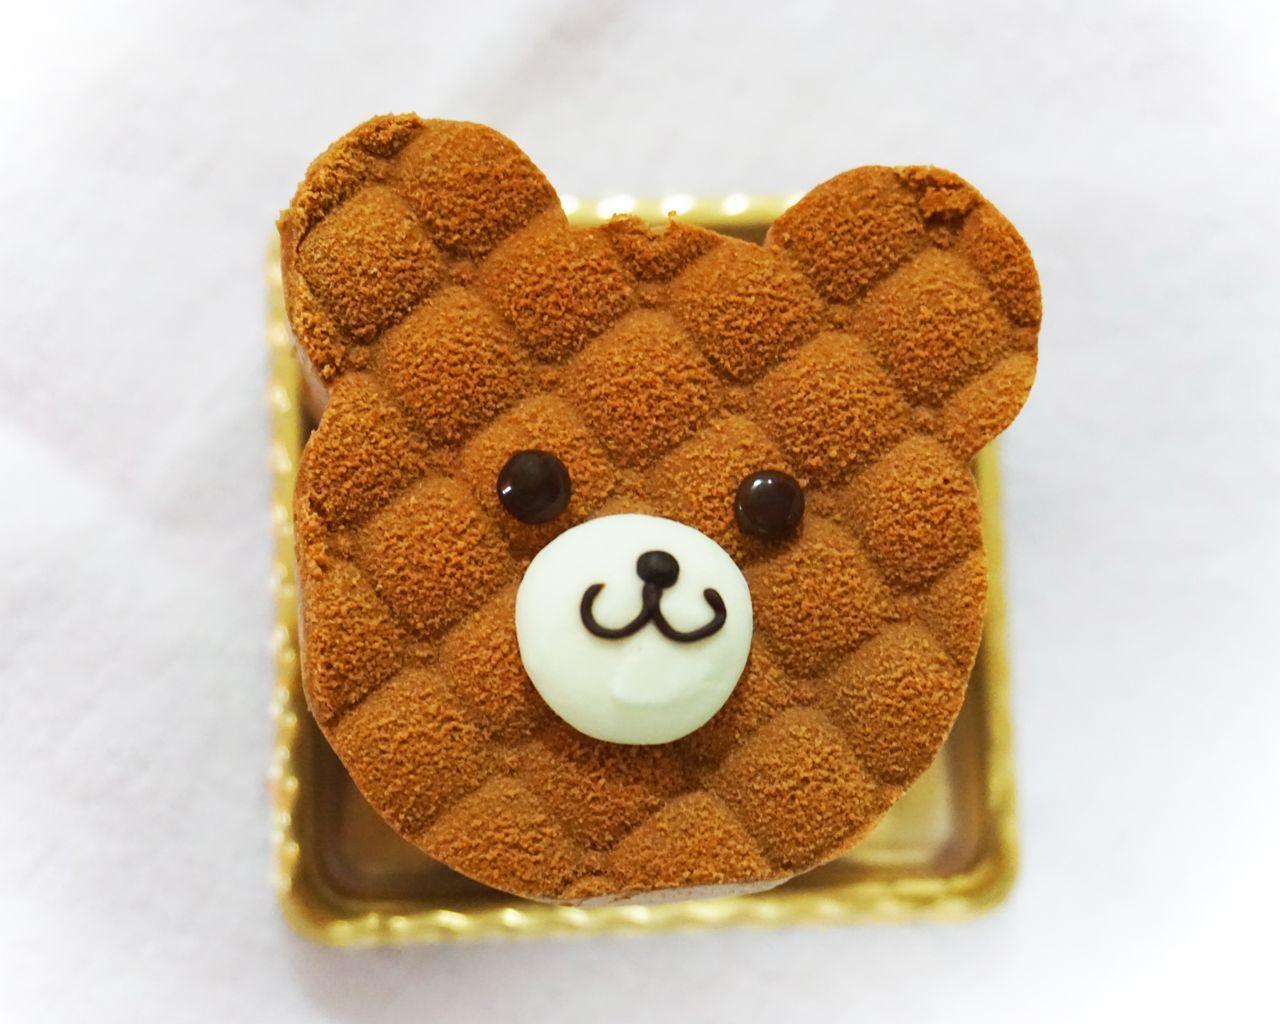 Antoine Santos Bear Cake Cake Shop Criollo Cute Dessert Ecolecriollo Japan Nakameguro Sweet Tokyo くま エコールクリオロ クリオロ ケーキ 2016